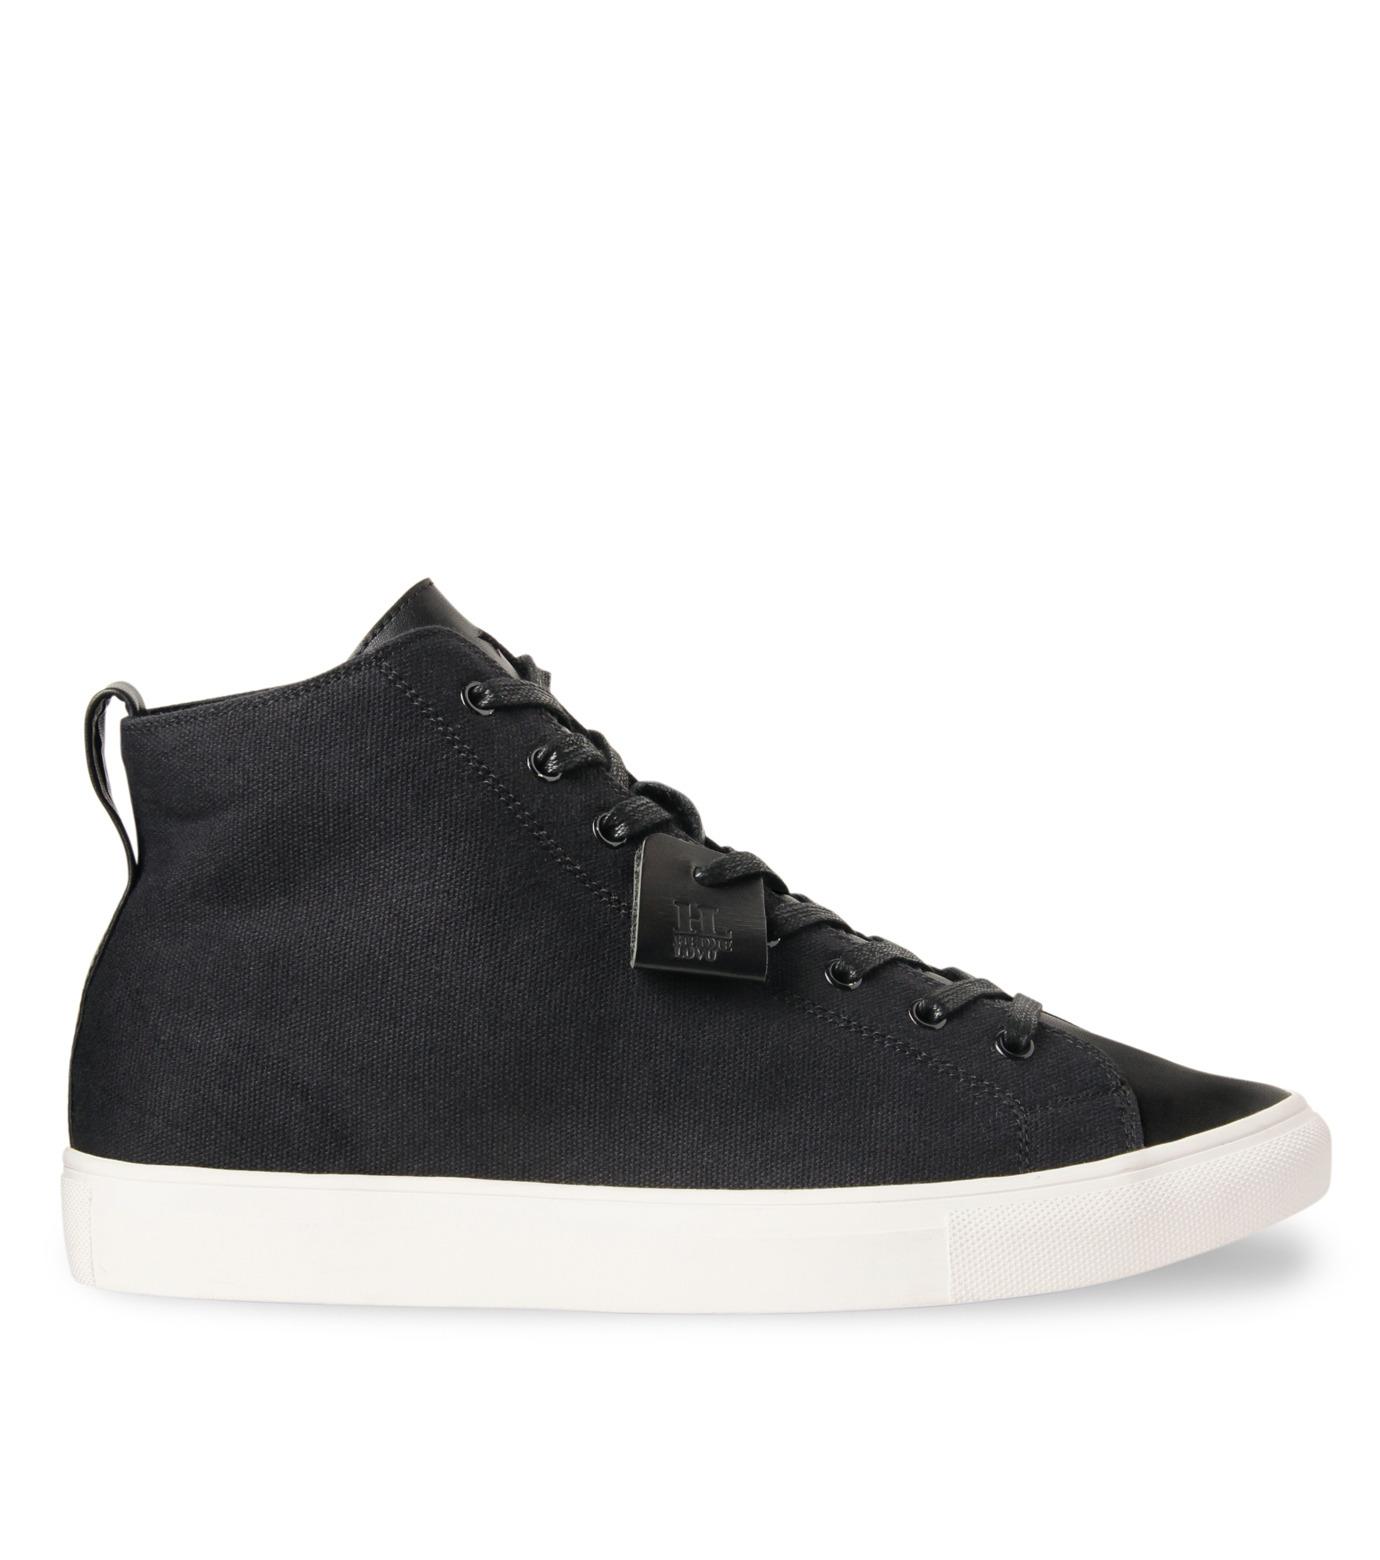 HL HEDDIE LOVU(エイチエル・エディールーヴ)のHL Hi sneaker-BLACK(スニーカー/sneaker)-16A90006-13 拡大詳細画像1